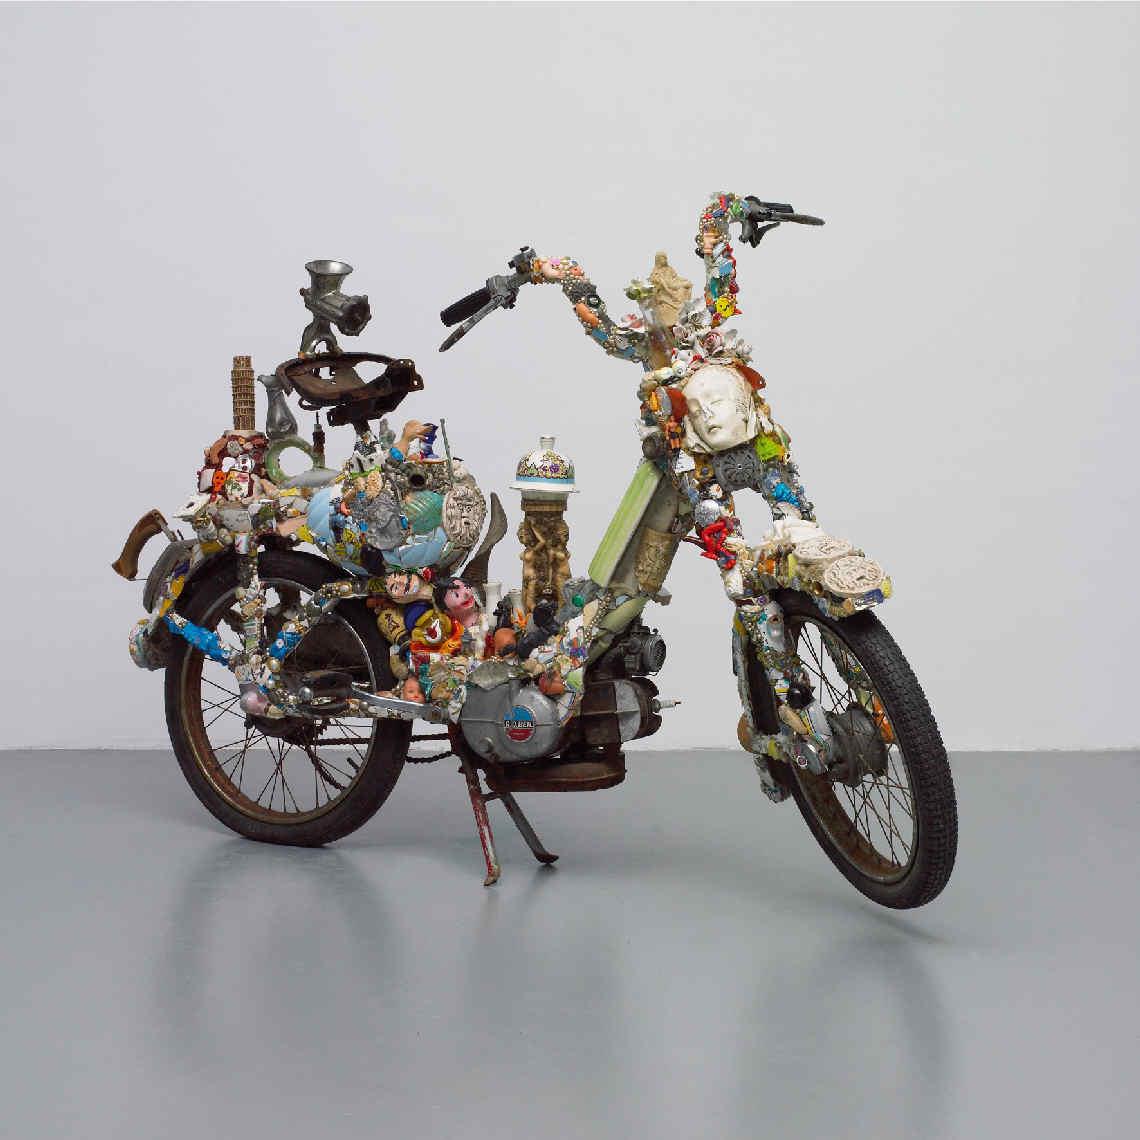 Motorino [Ciclomotor]